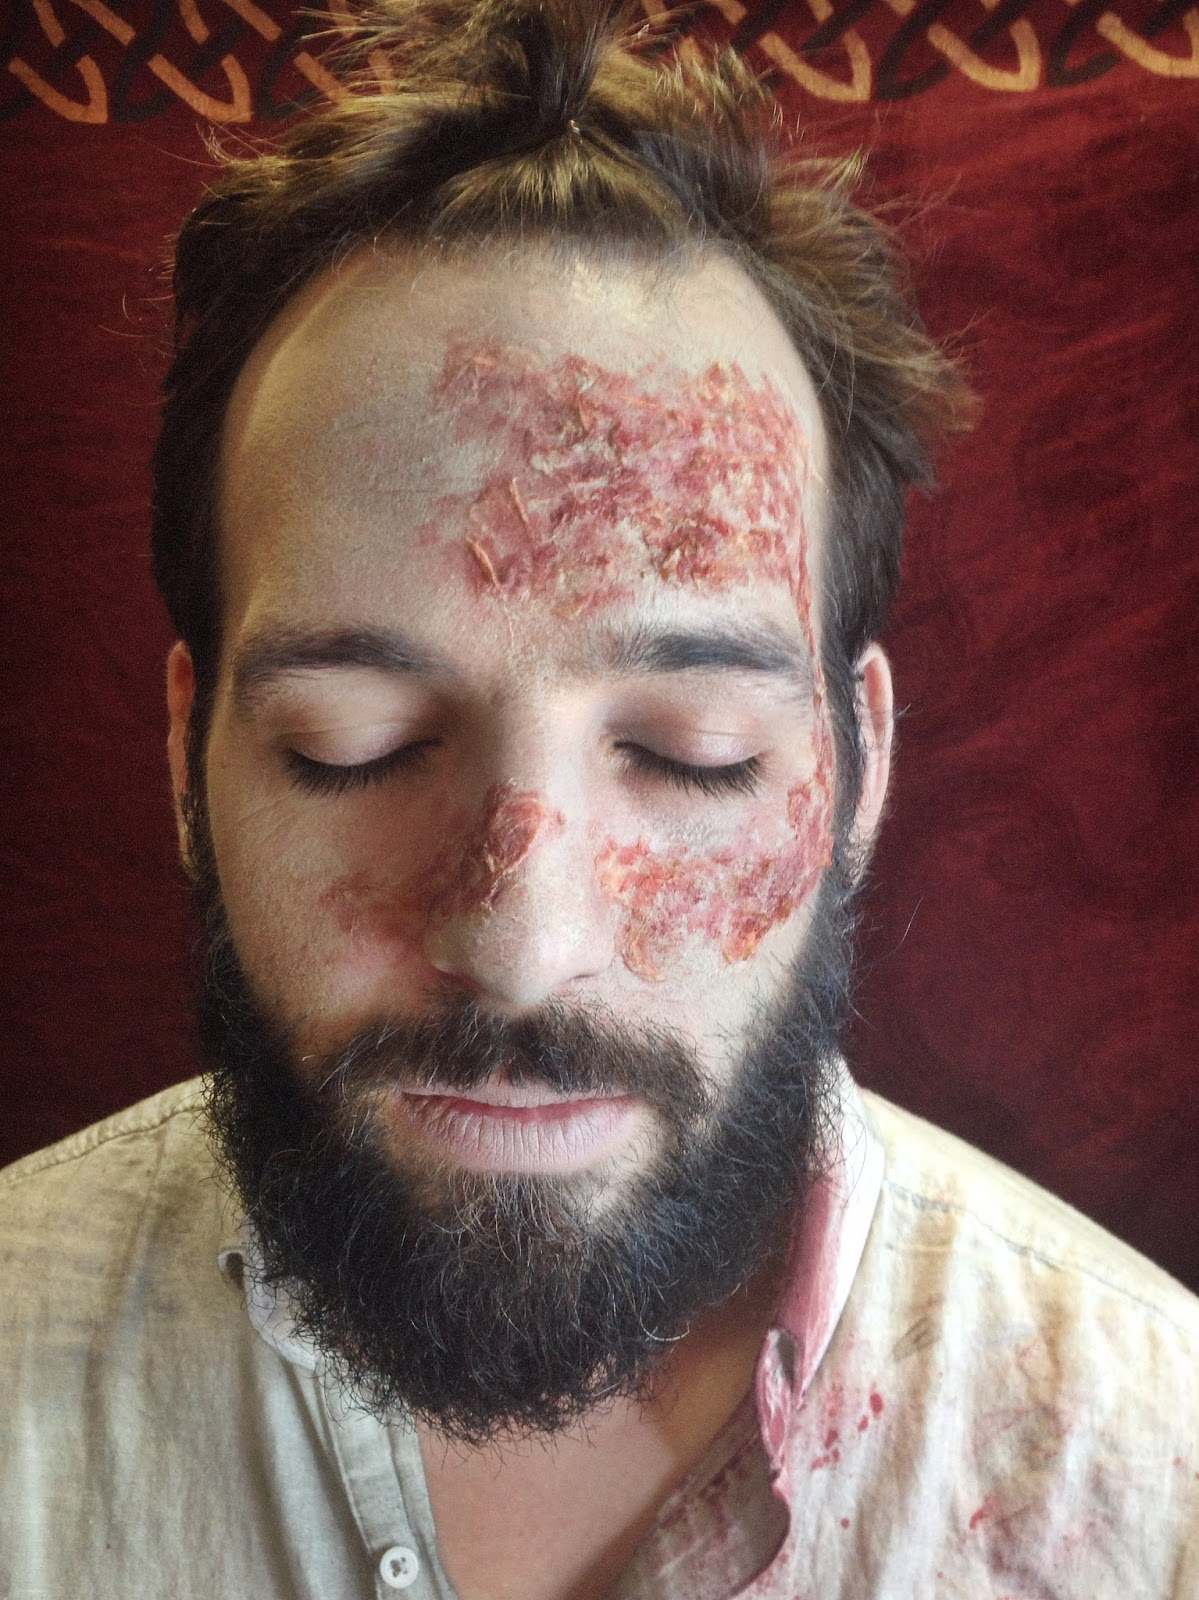 maquillage zombie avec barbe